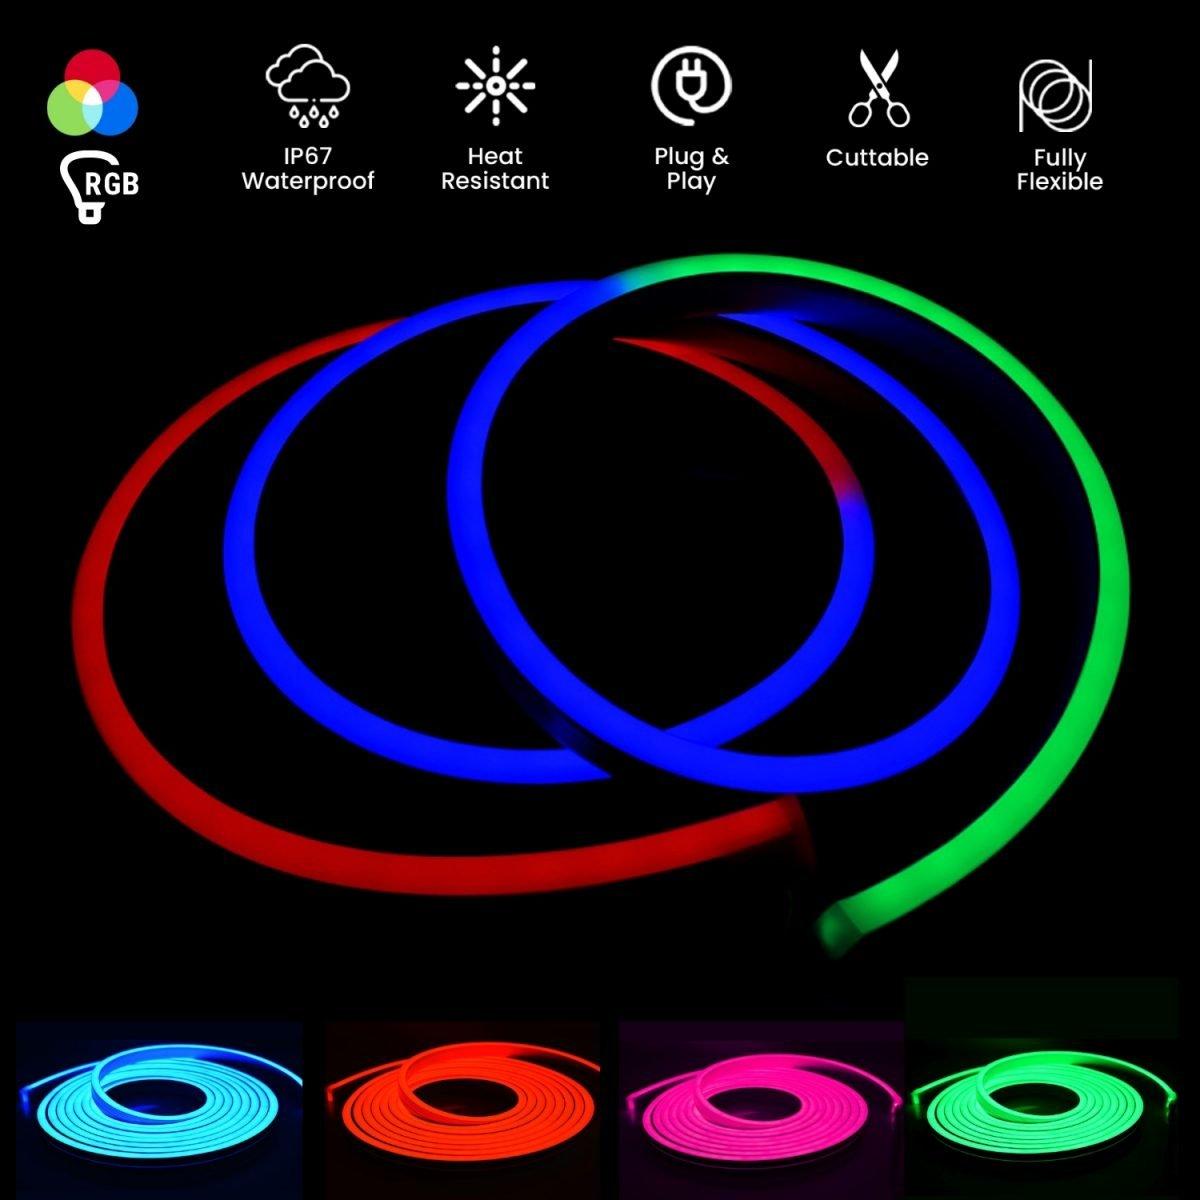 RGB Neon Flex 12V 10 x 20mm IP67 - ukledlights.co.uk